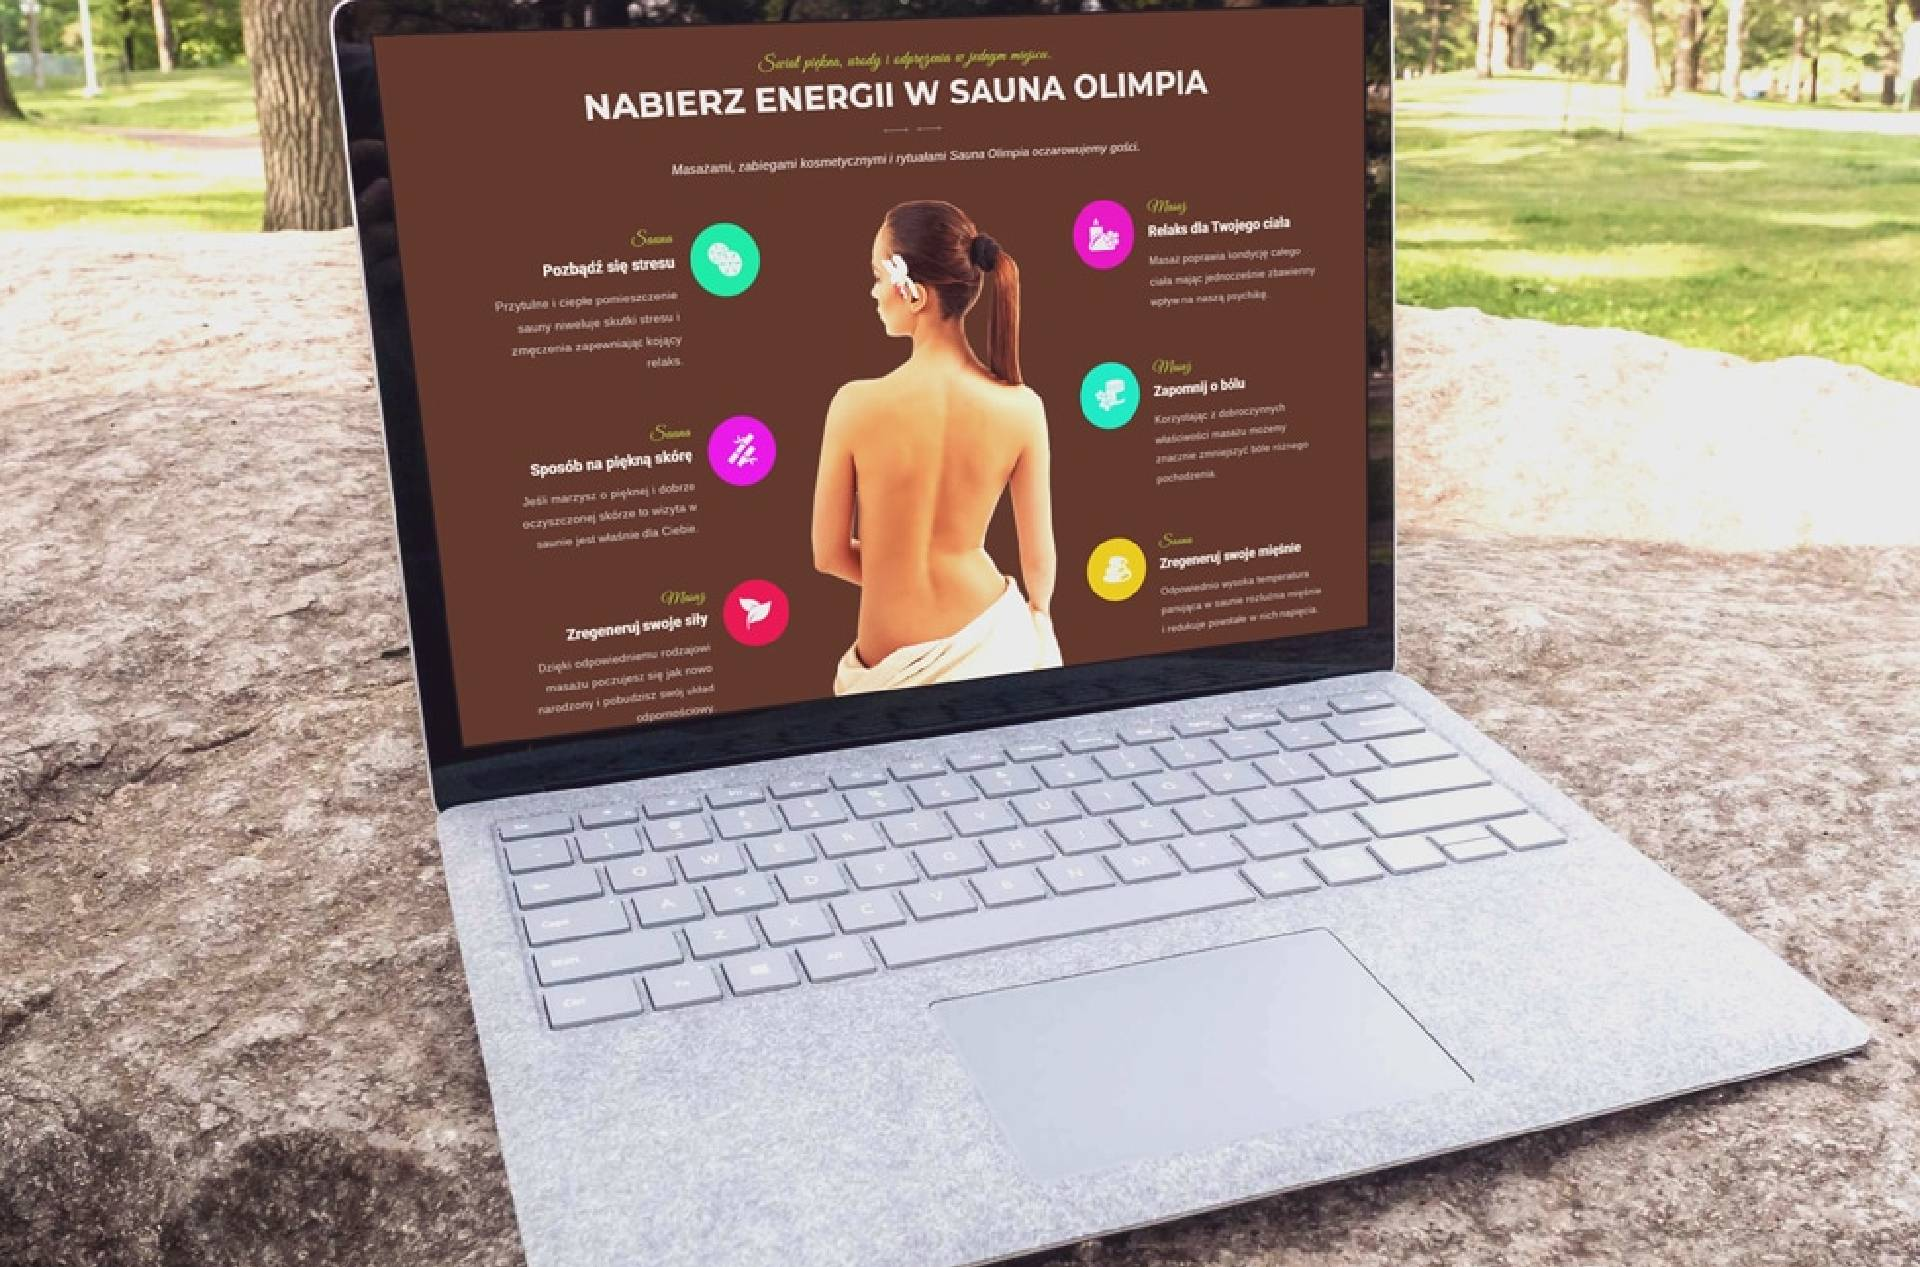 ROAN24 Sauna Olimpia-websted